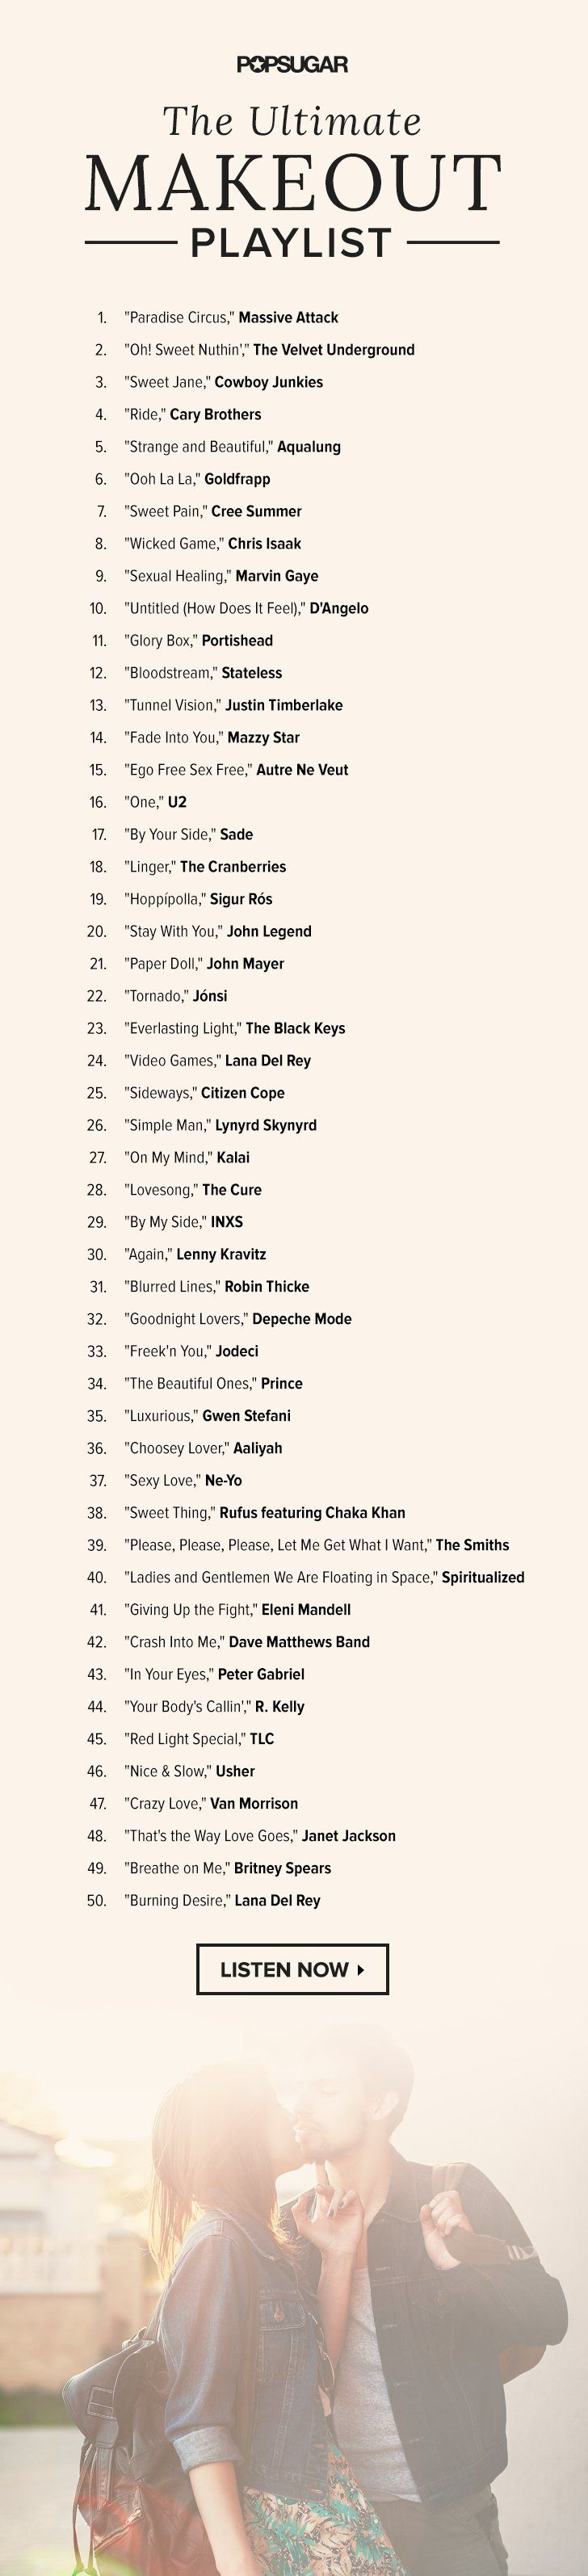 58 Music Soundtracks Ideas Soundtrack Music Songs